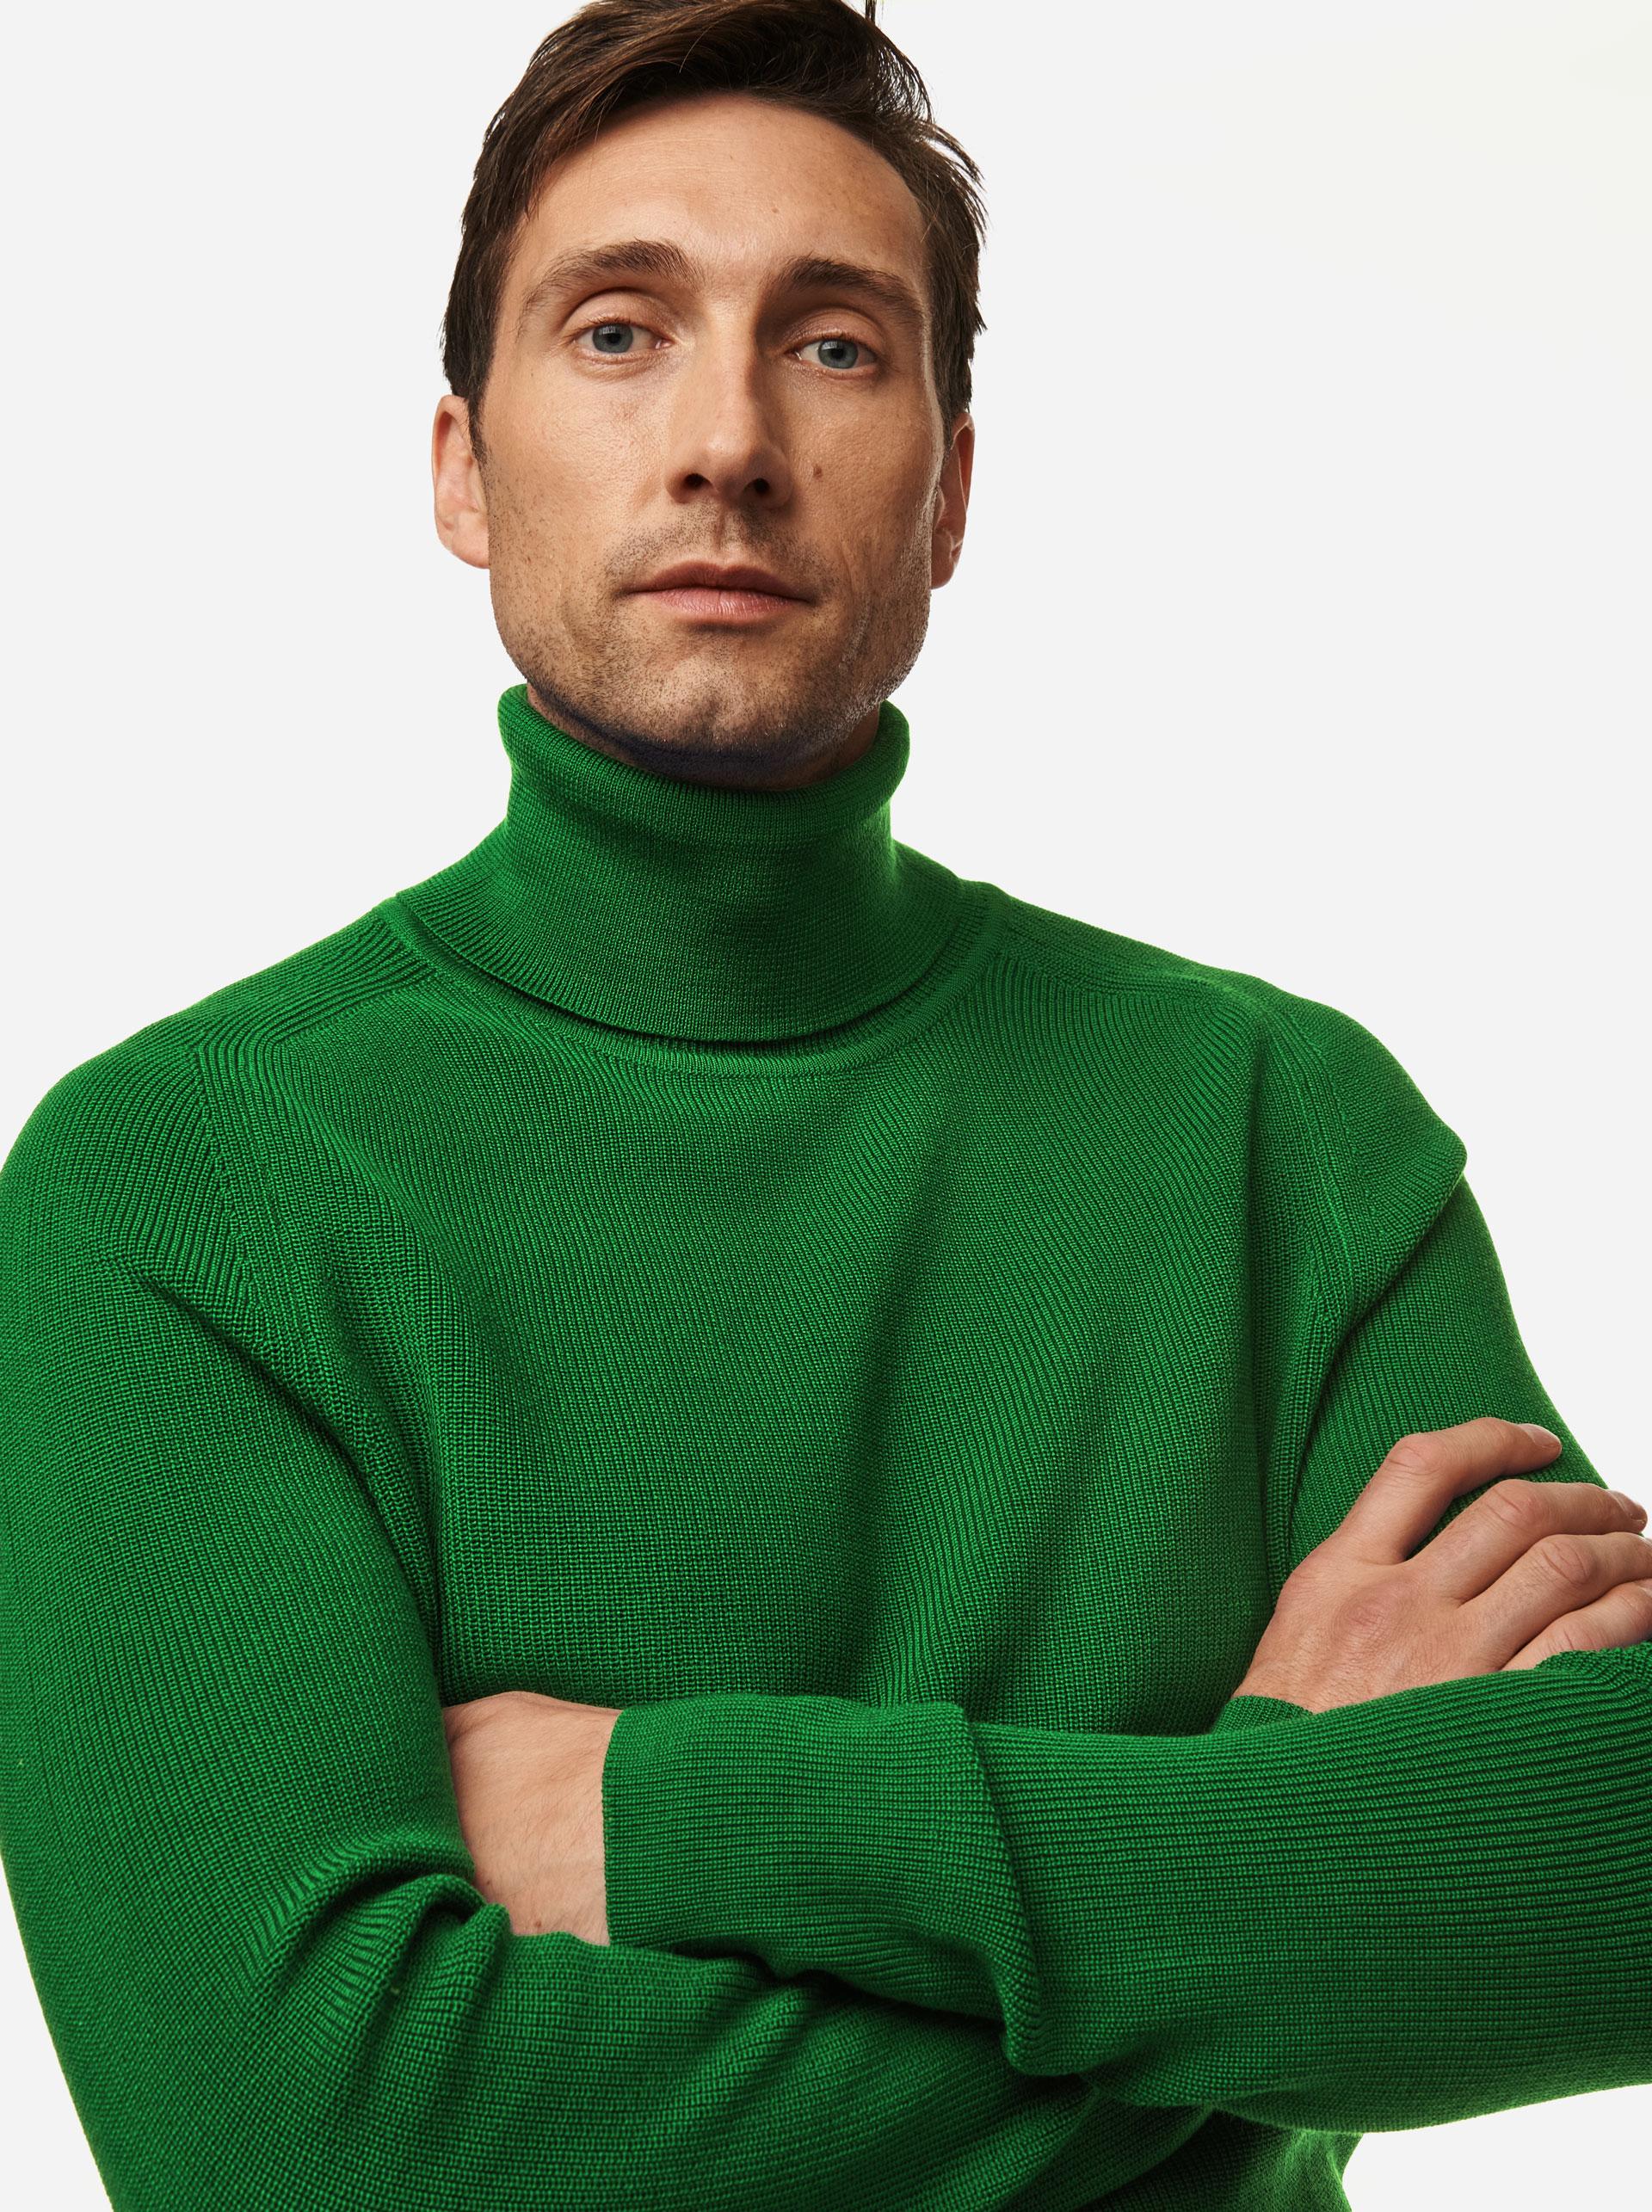 Teym - Turtleneck - The Merino Sweater - Men - Bright Green - 3